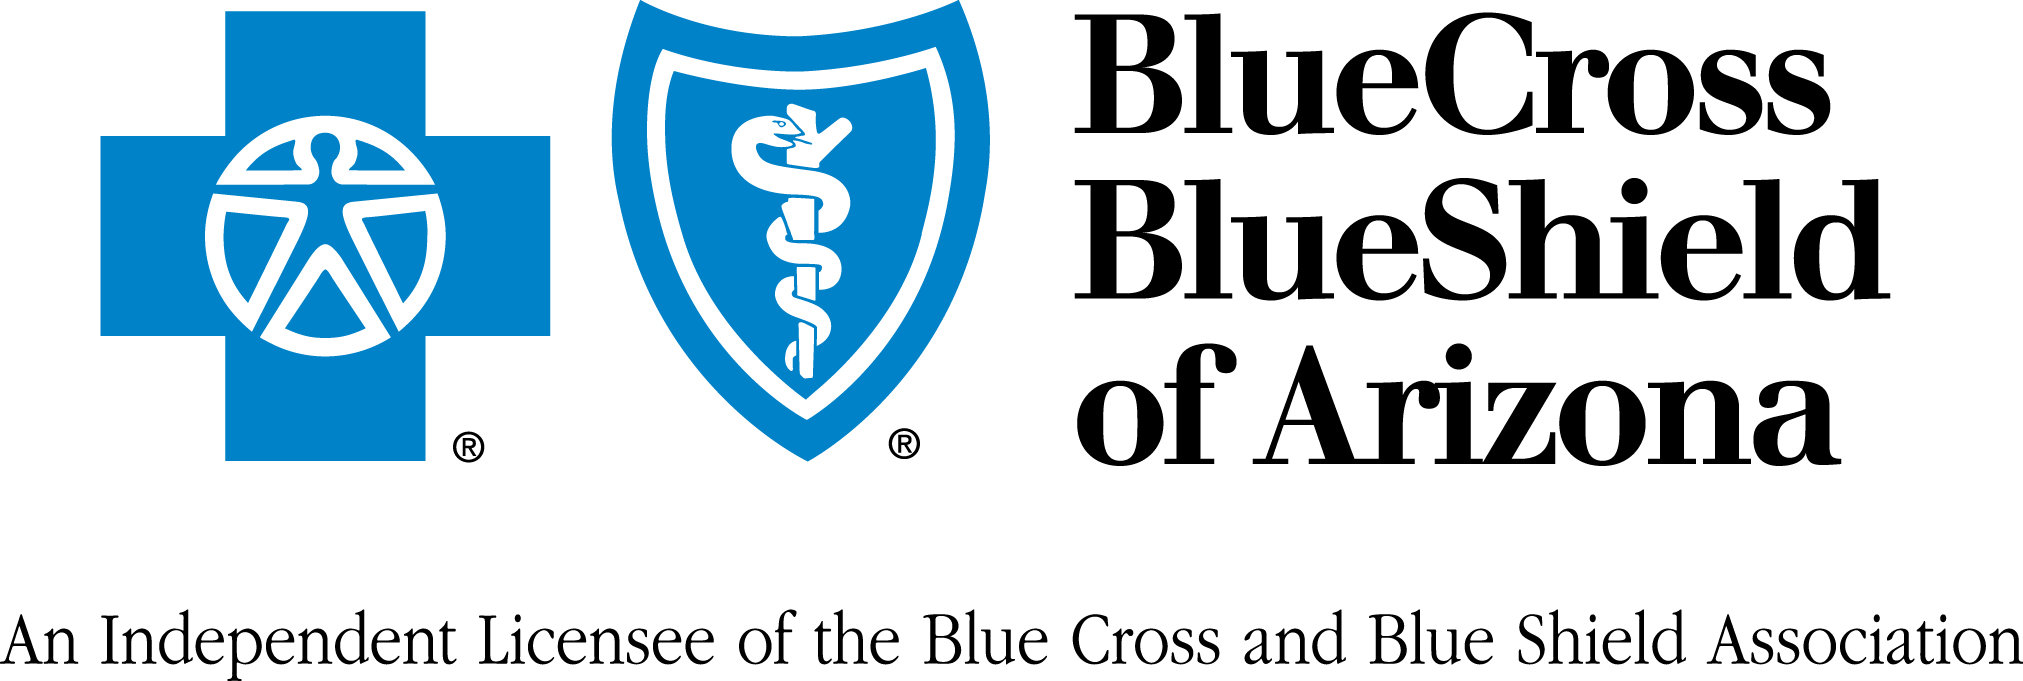 bcbsaz_logo_blue_black.jpg